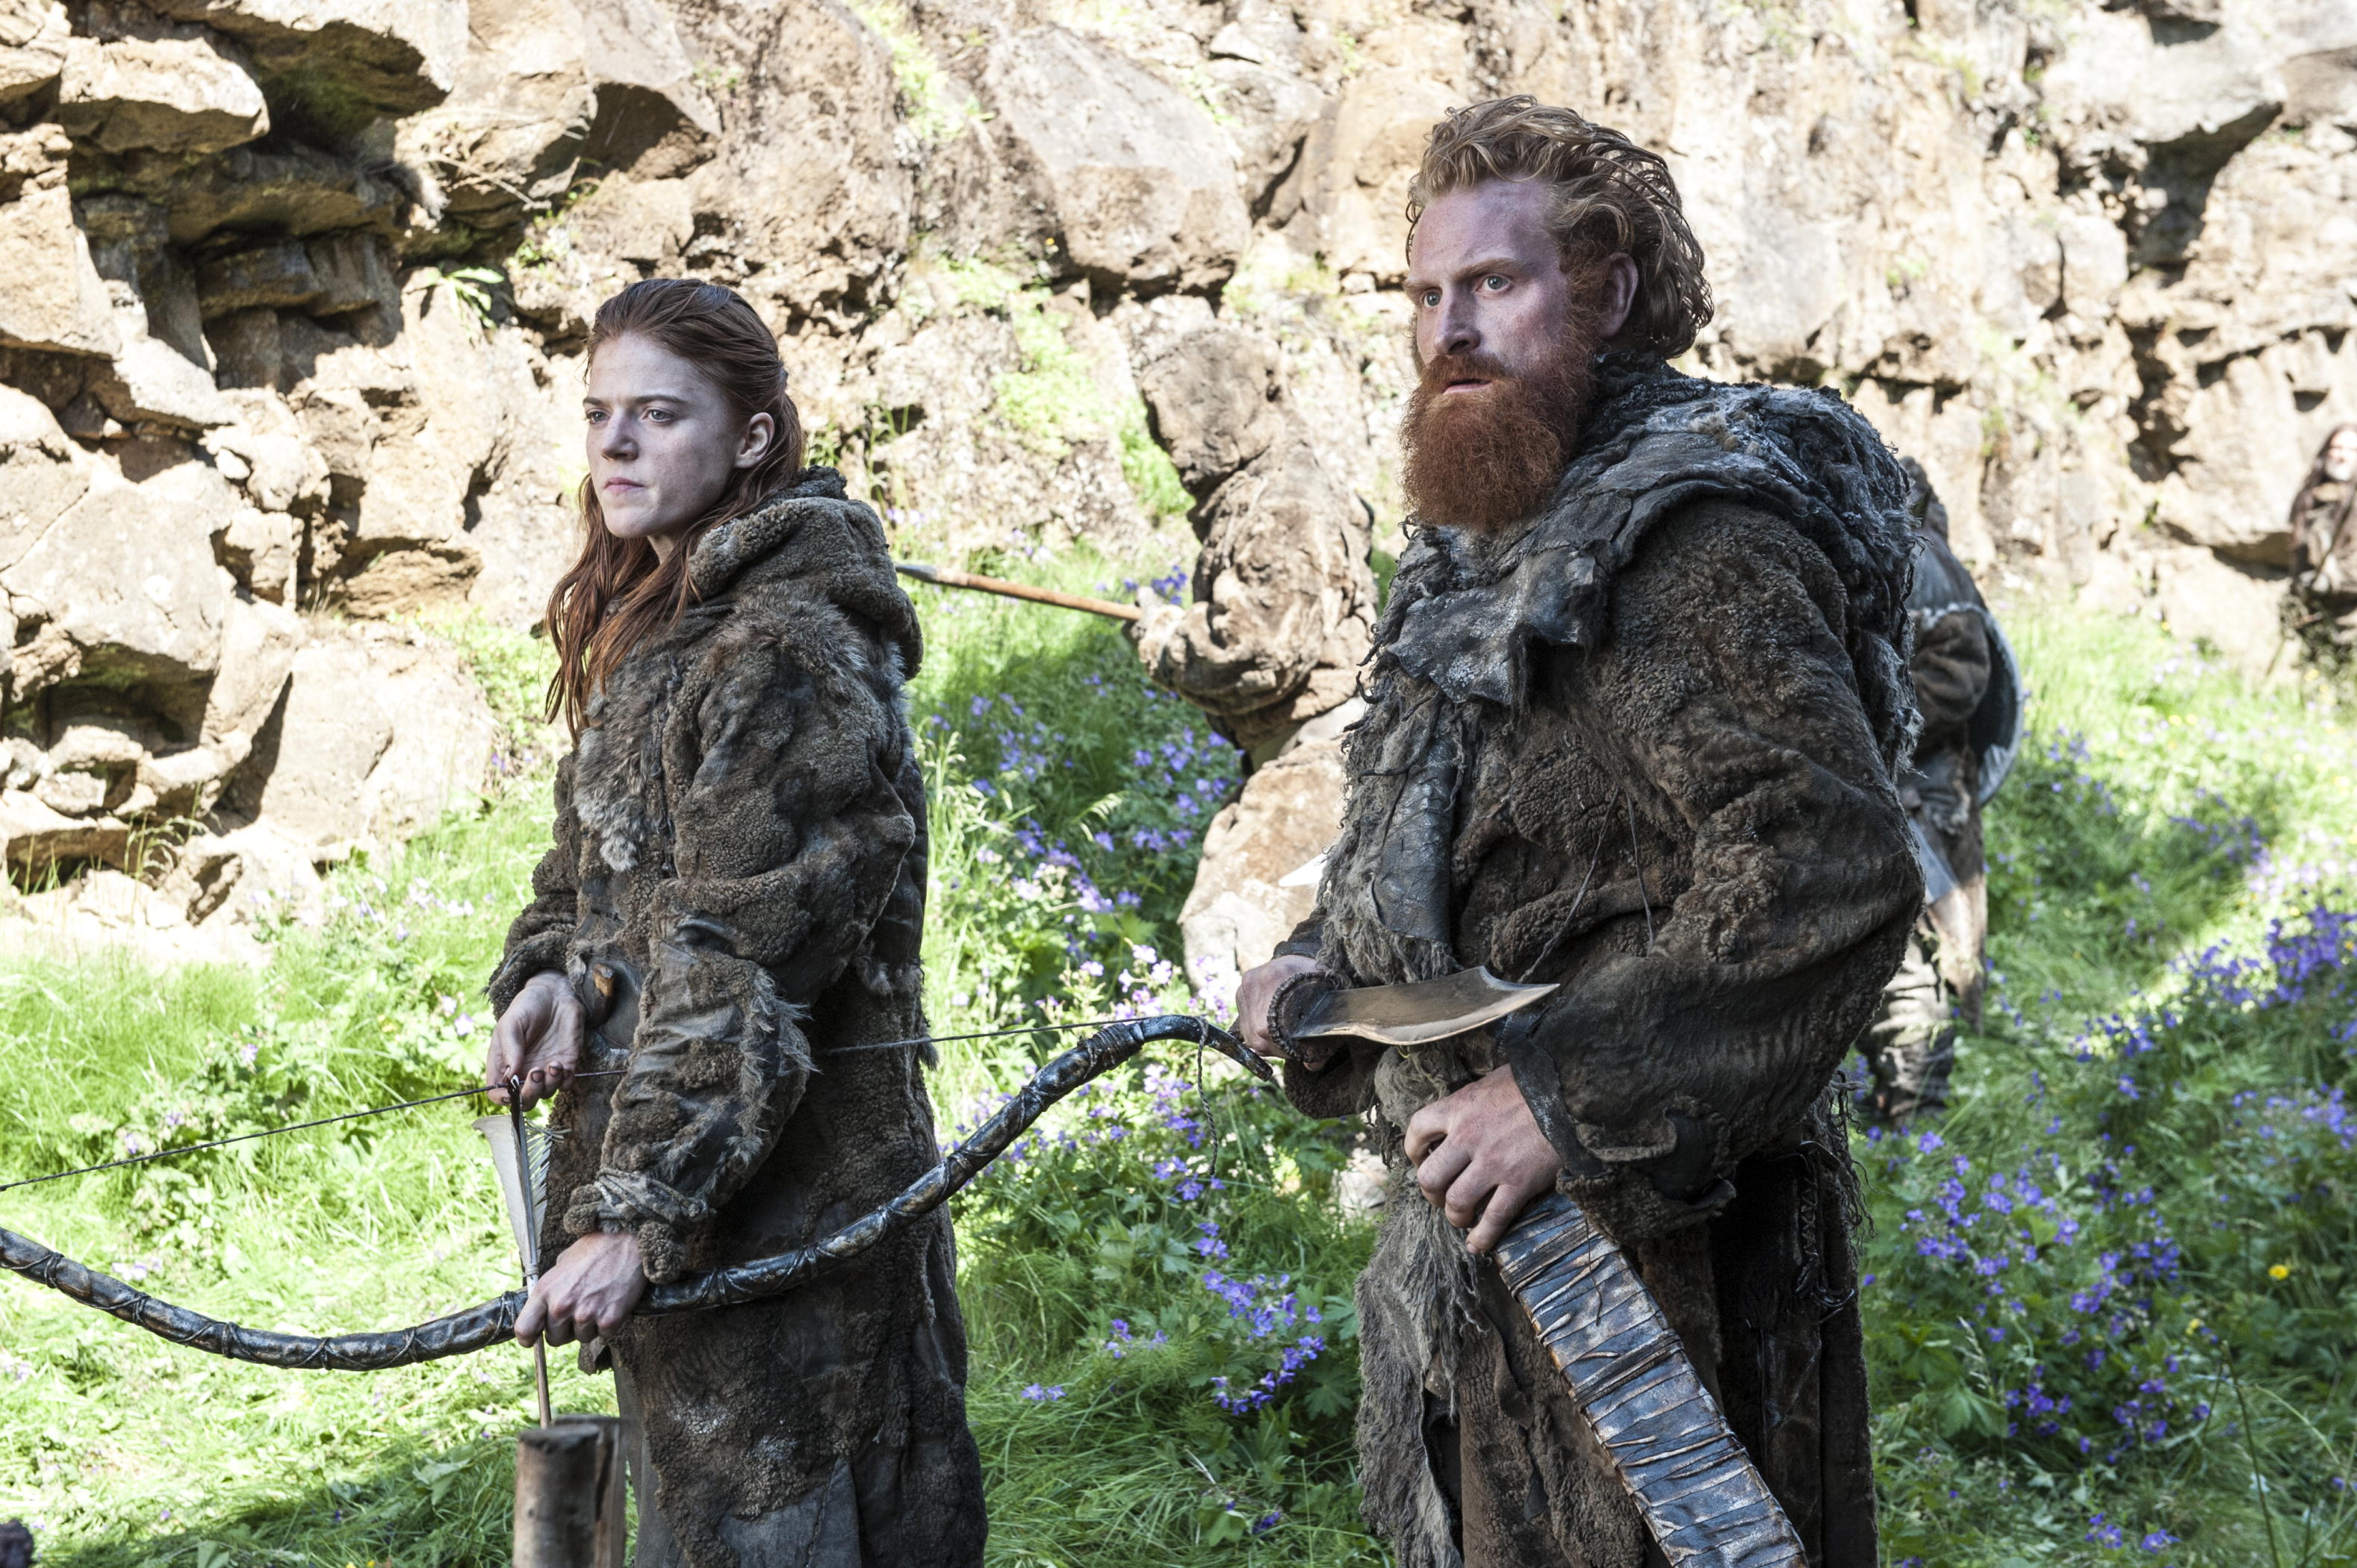 Game-Of-Thrones-Season-4-Rose-Leslie-Ygritte-Kristofer-Hivju-Tormund_HBO